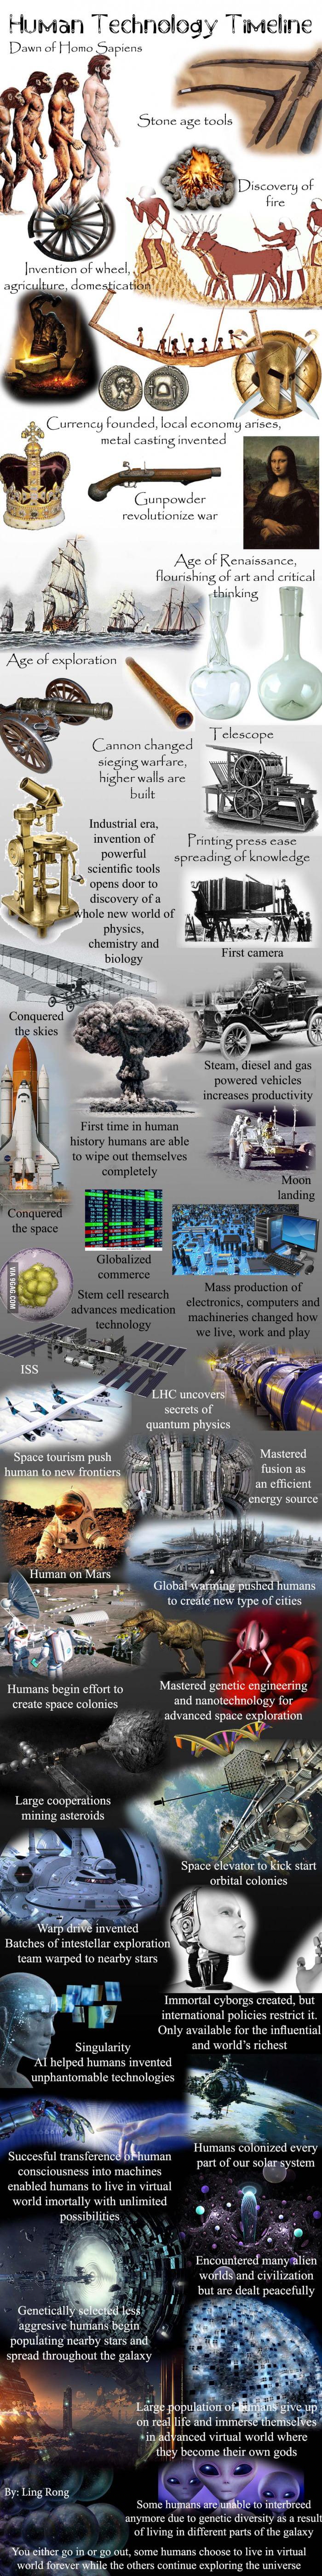 Human Technology Timeline ...